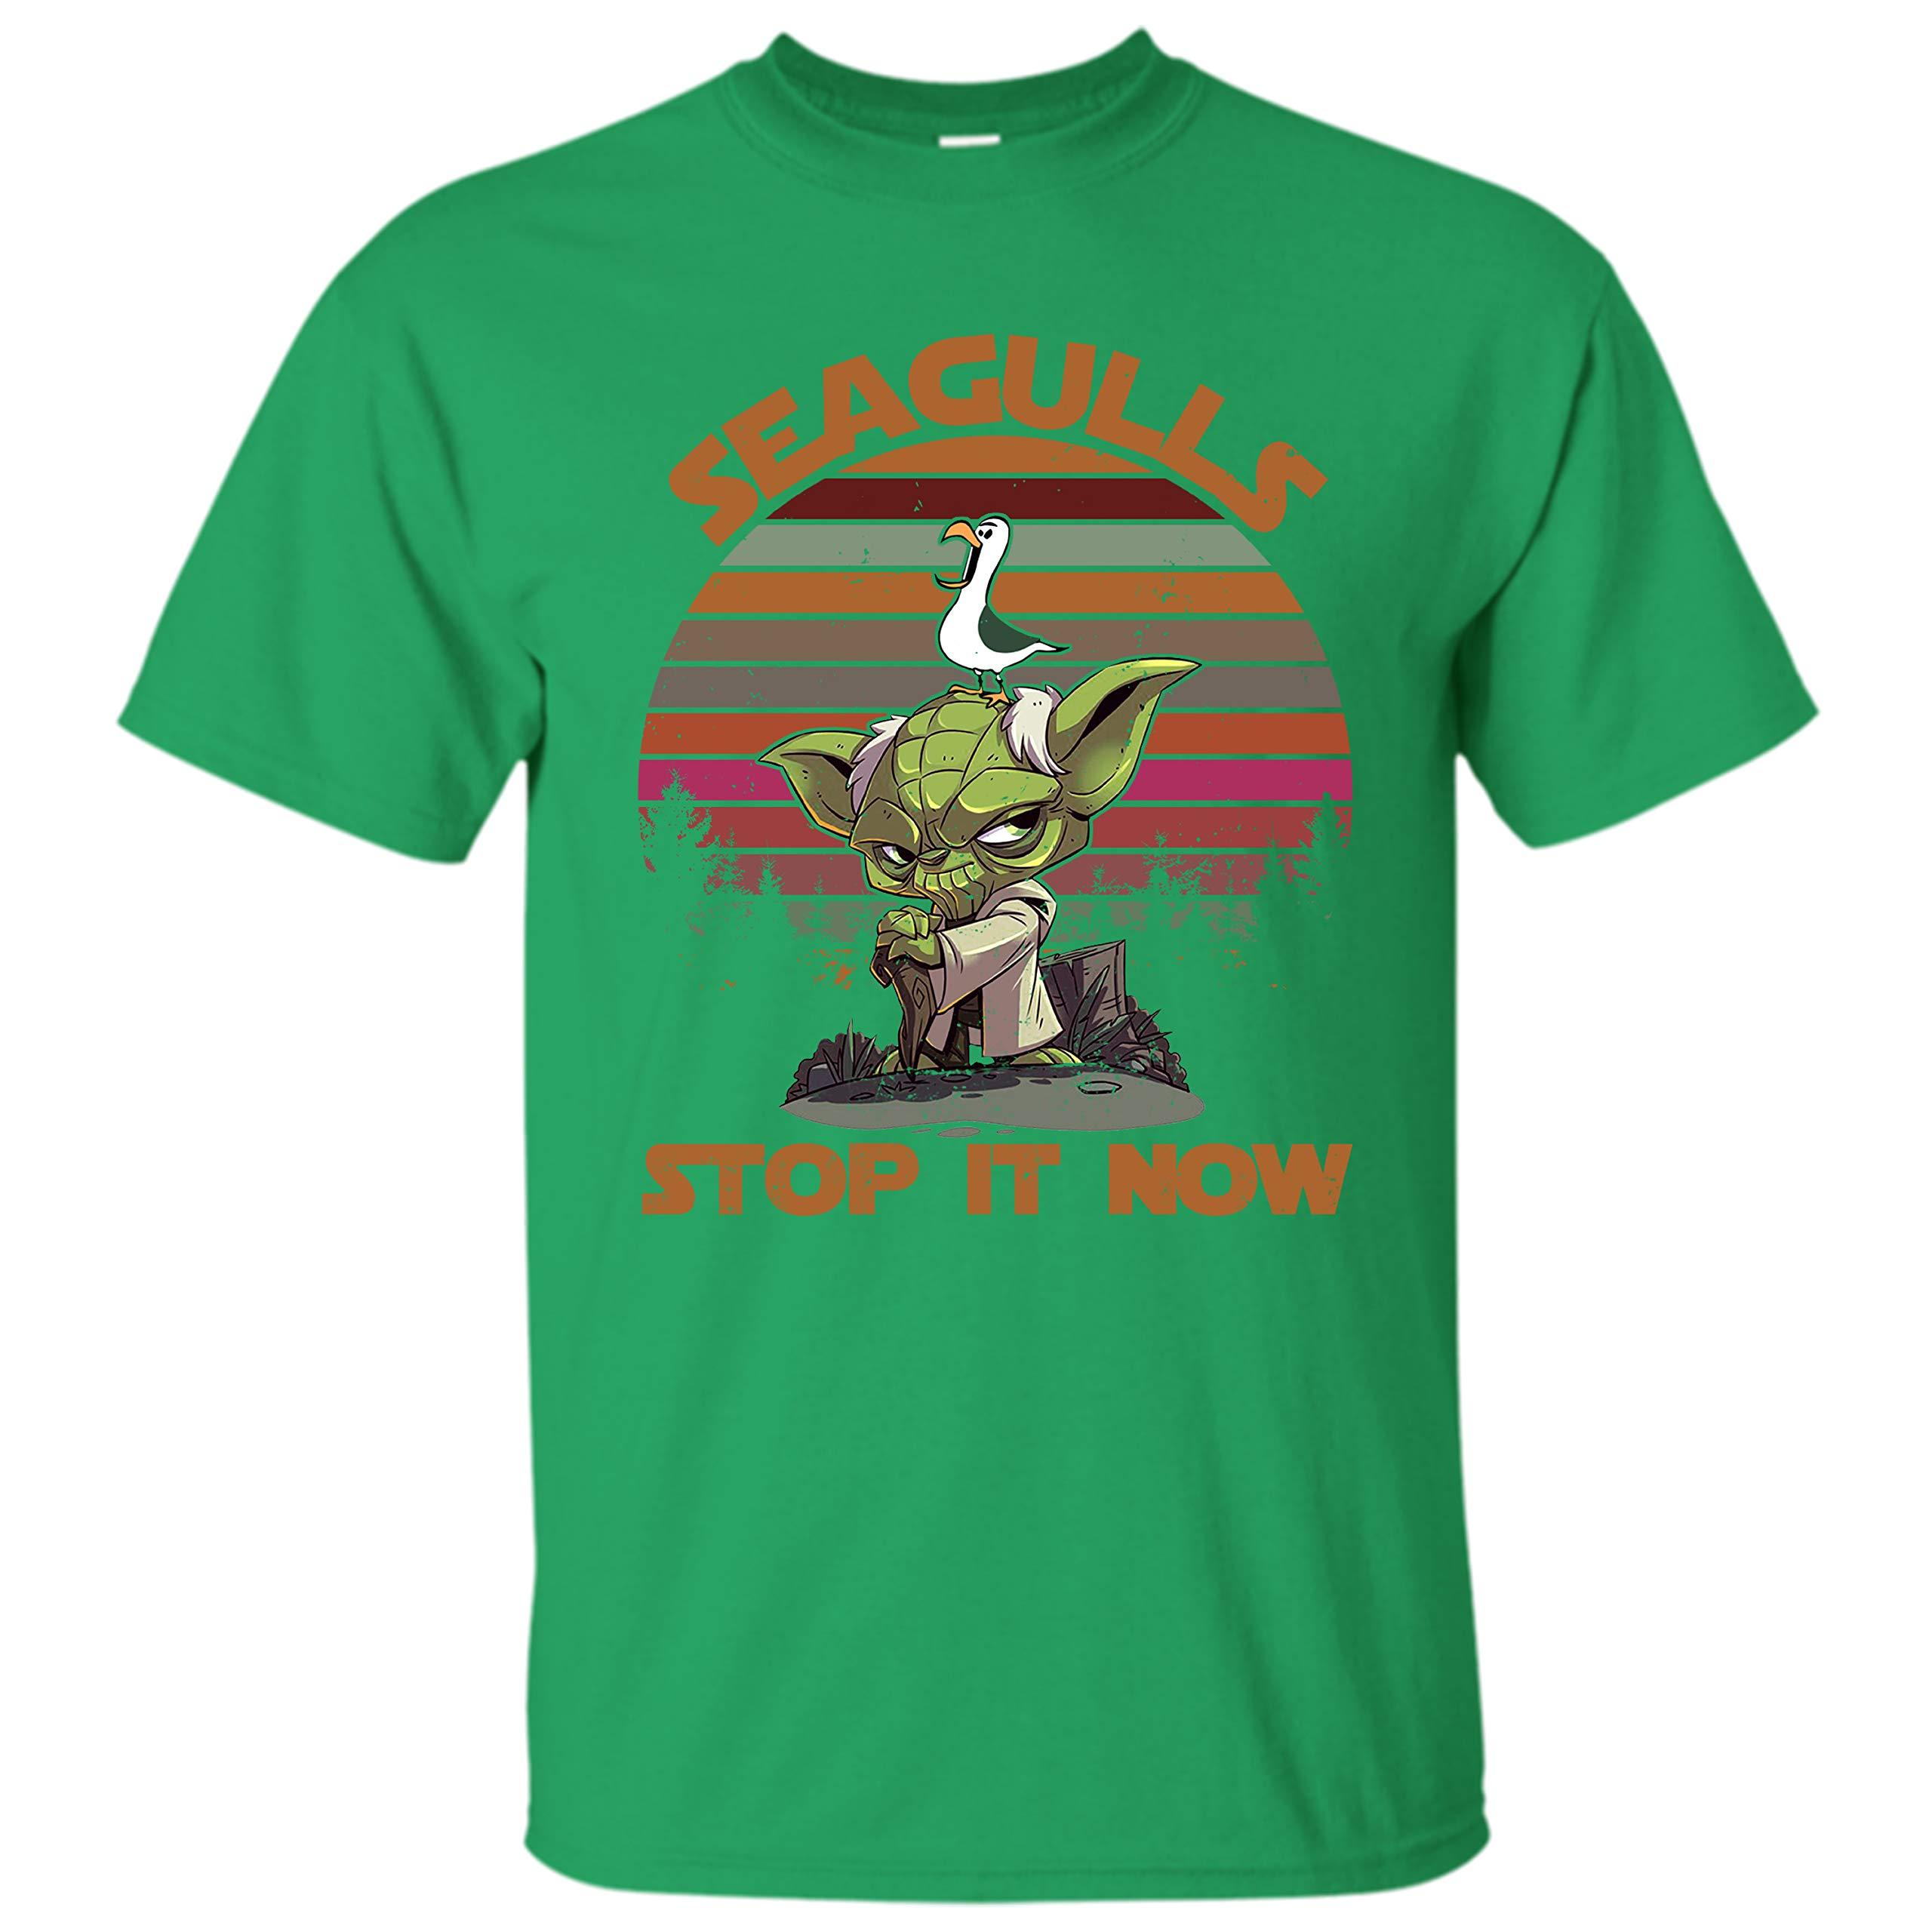 Seagulls Stop It Now Shirt 8002